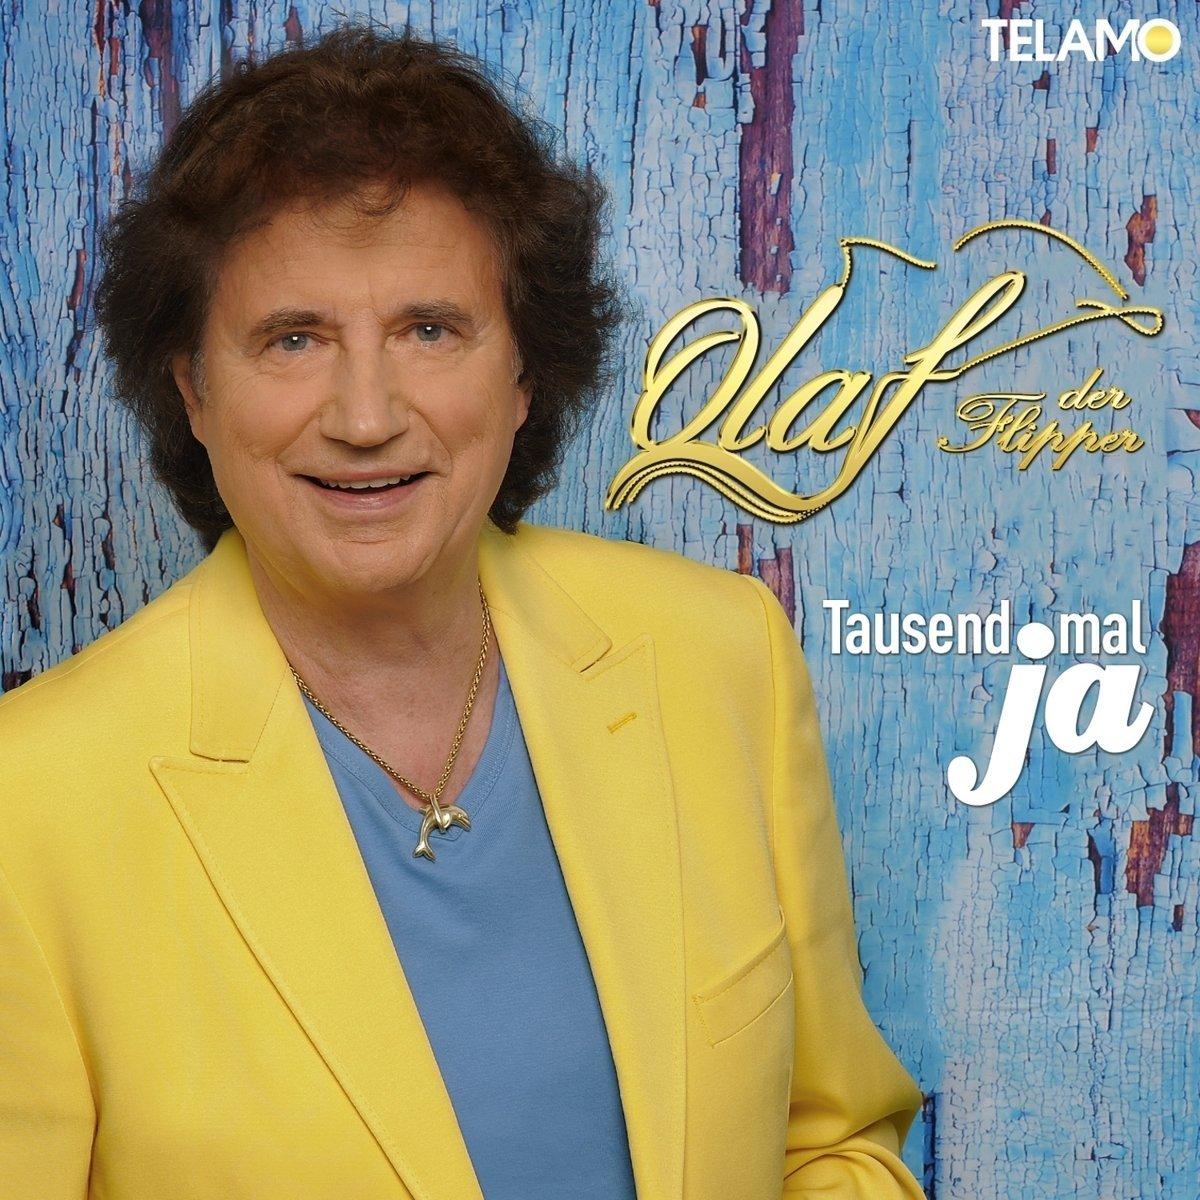 OLAF DER FLIPPER - Tausendmal Ja